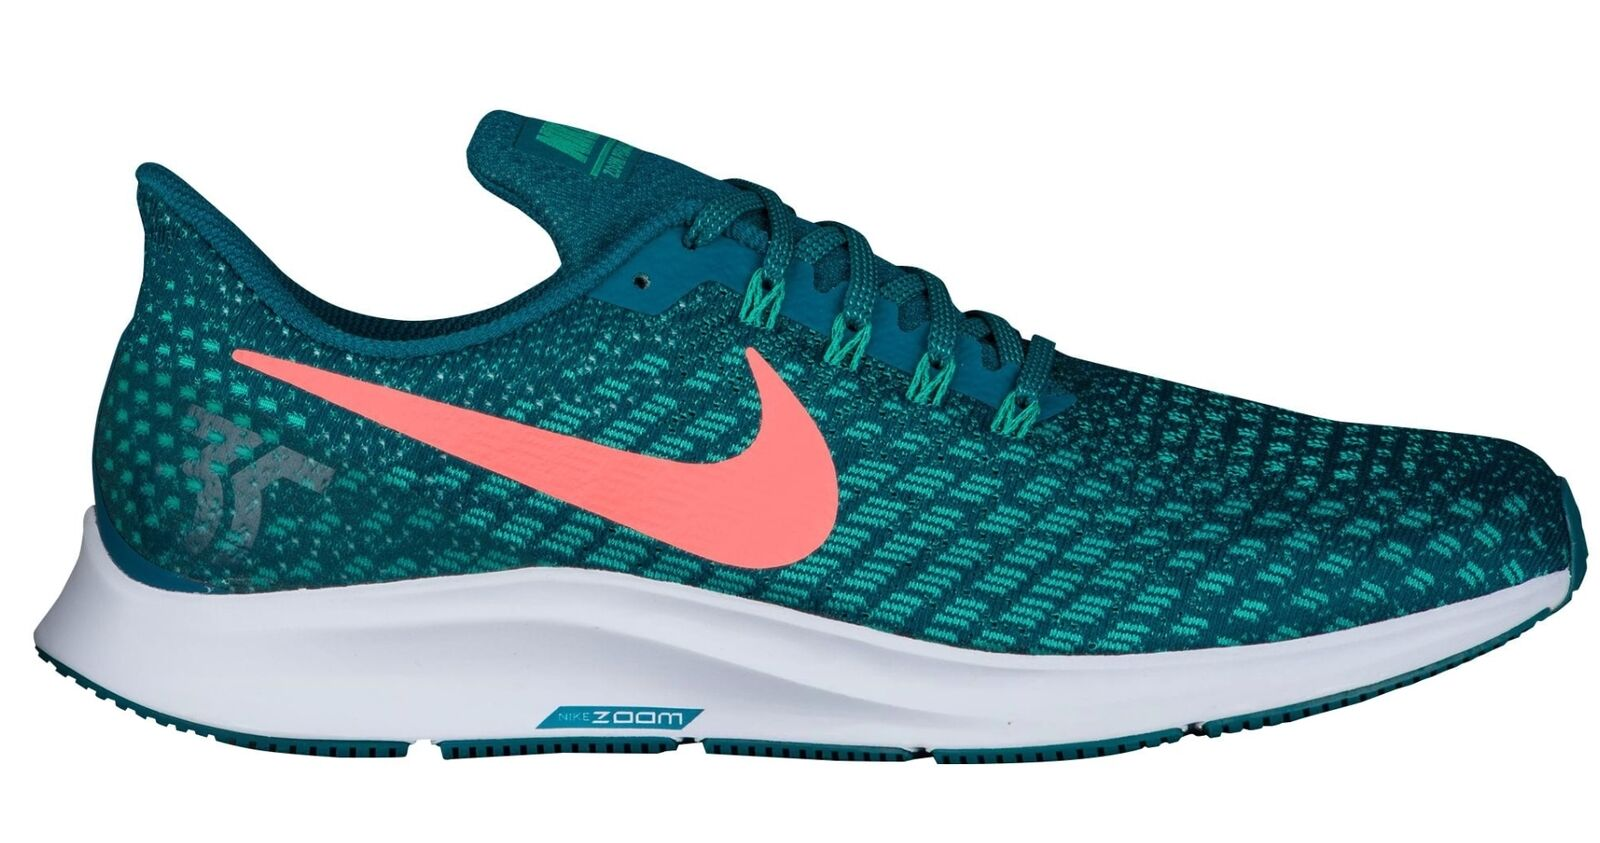 Nike Air Zoom Pegasus 35 Mens 942851-300 Geode Teal Mesh Running shoes Size 14